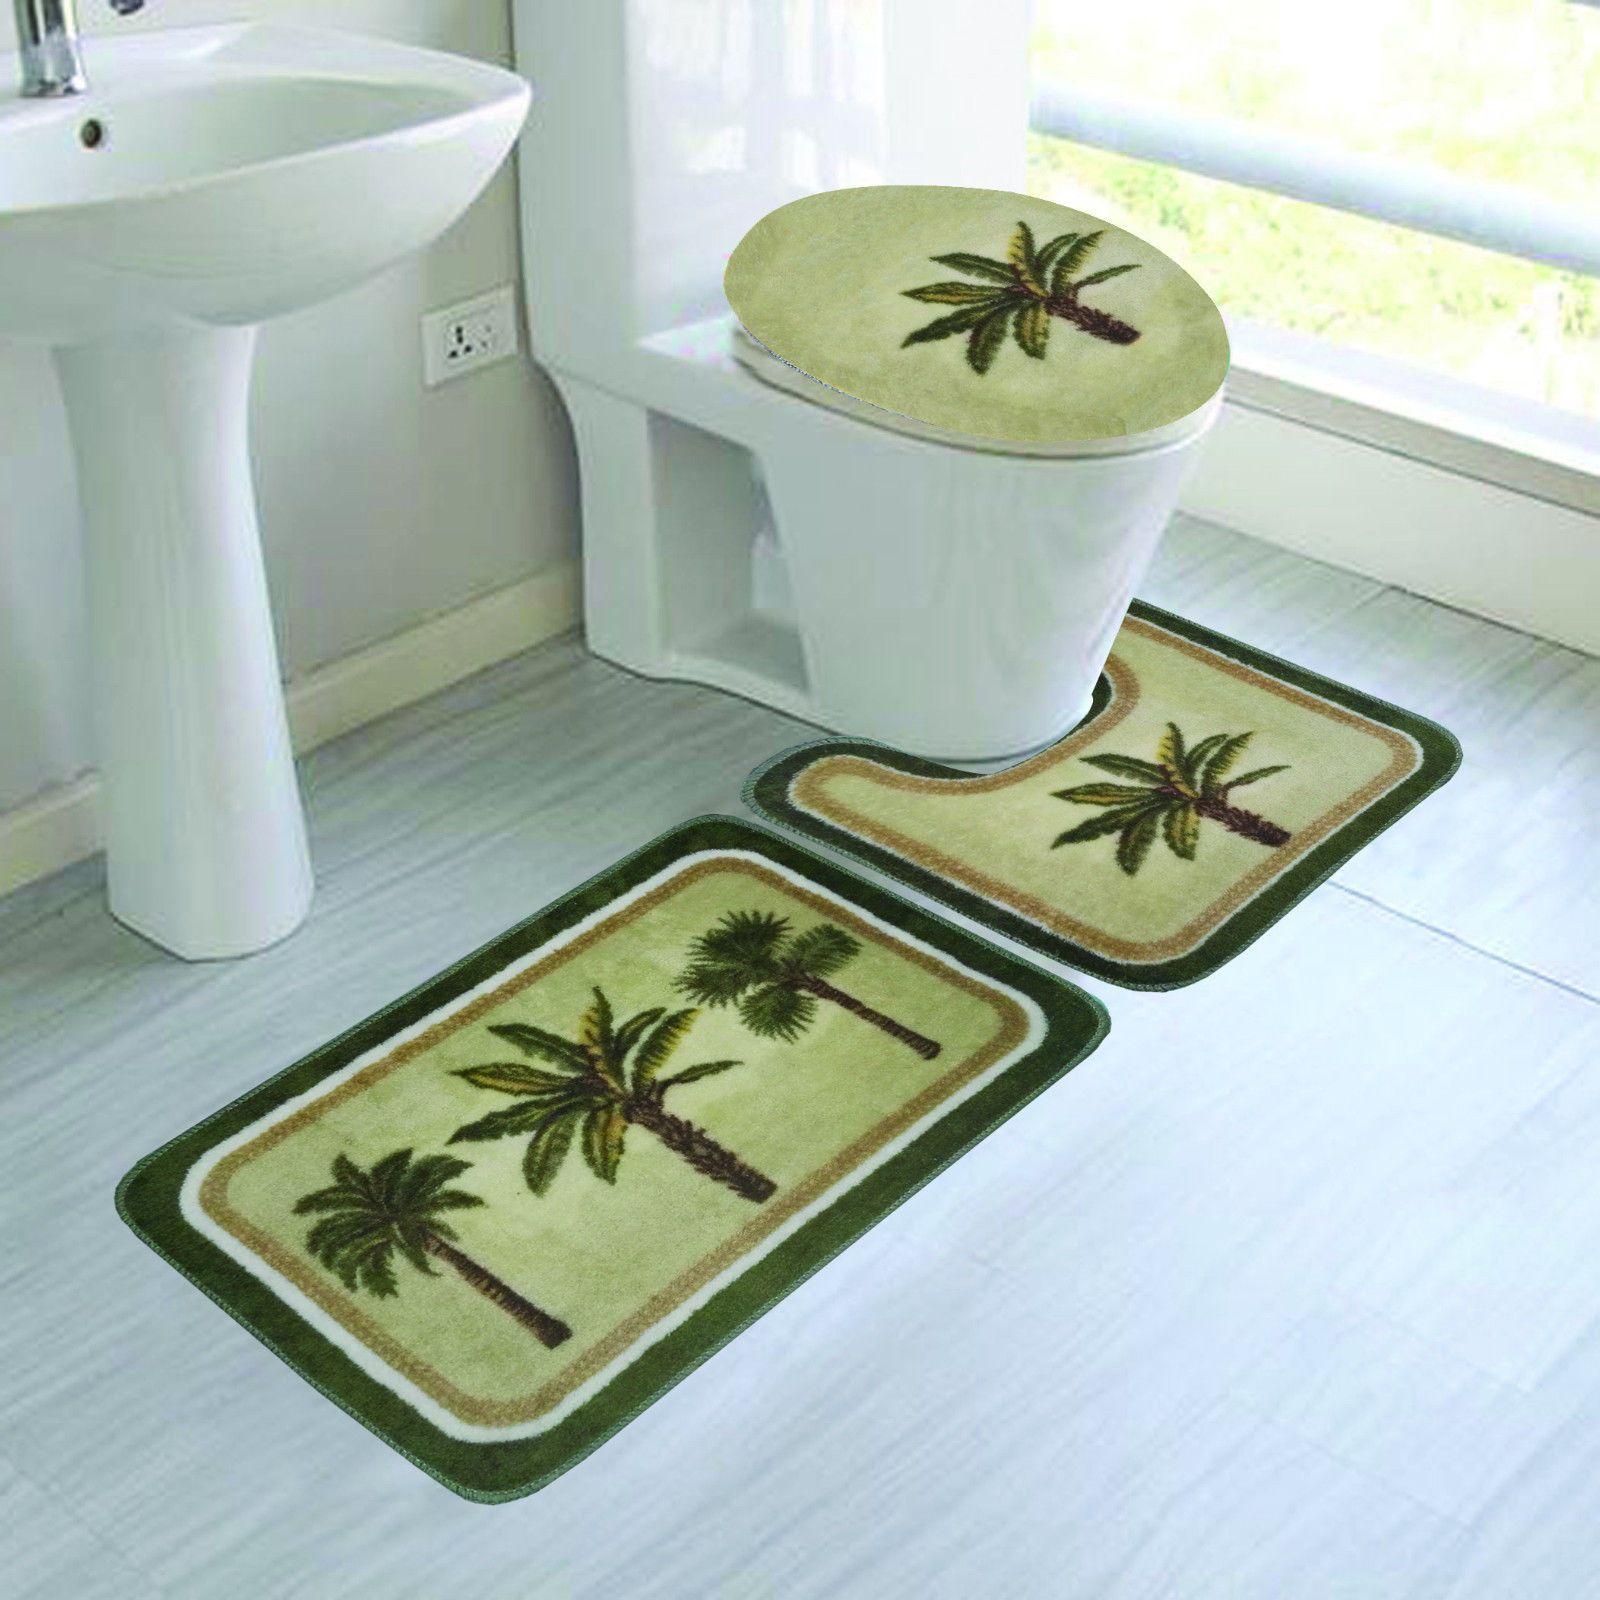 Bathroom Bath Non Slip Rug Mat Set Toilet Lid Cover 3pc Palm Tree Bathroom Rug Sets Rugs Bathroom Bath